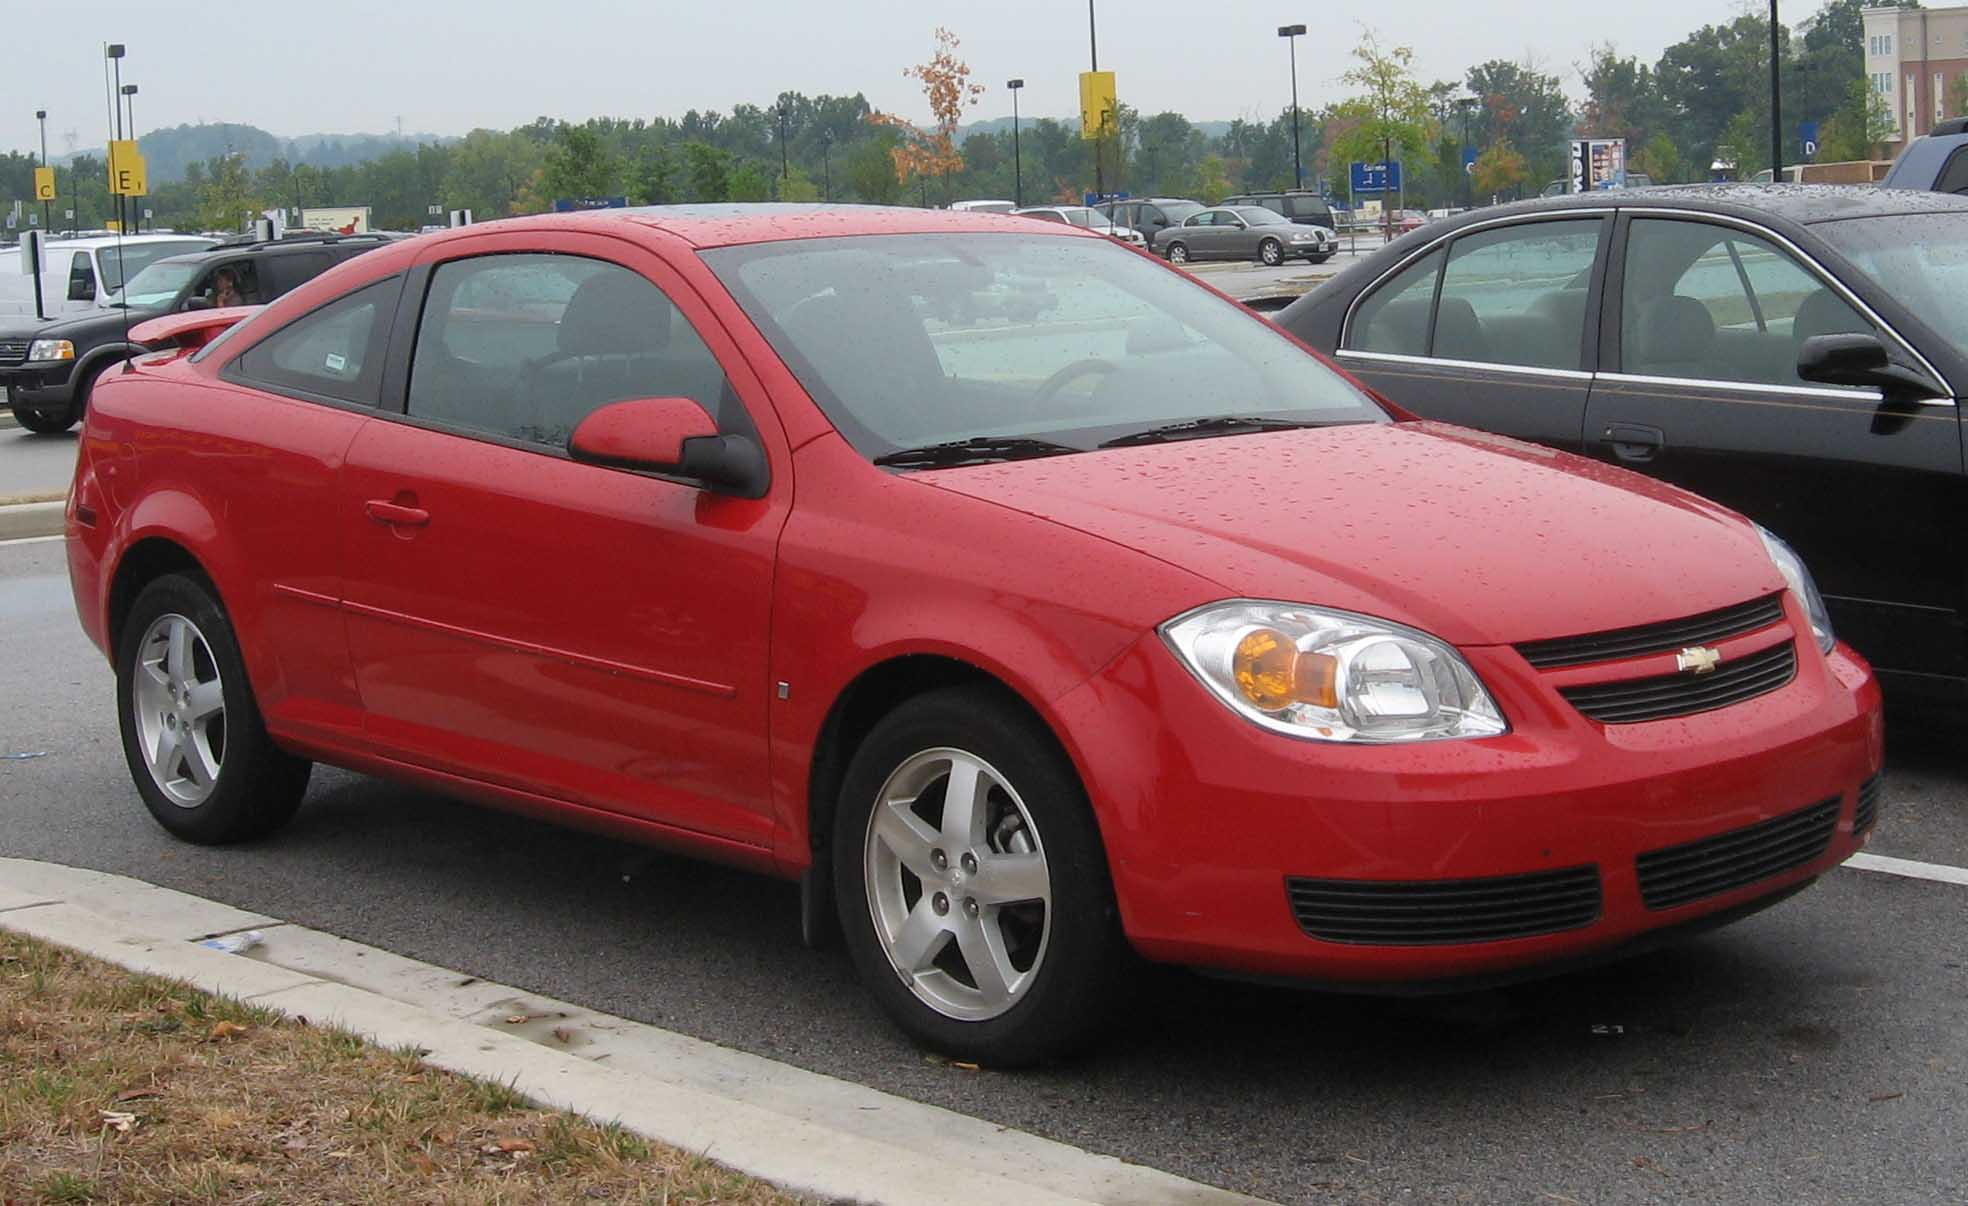 2007 Chevrolet Cobalt Information And Photos Zombiedrive Chevy Silverado Fuse Box 17